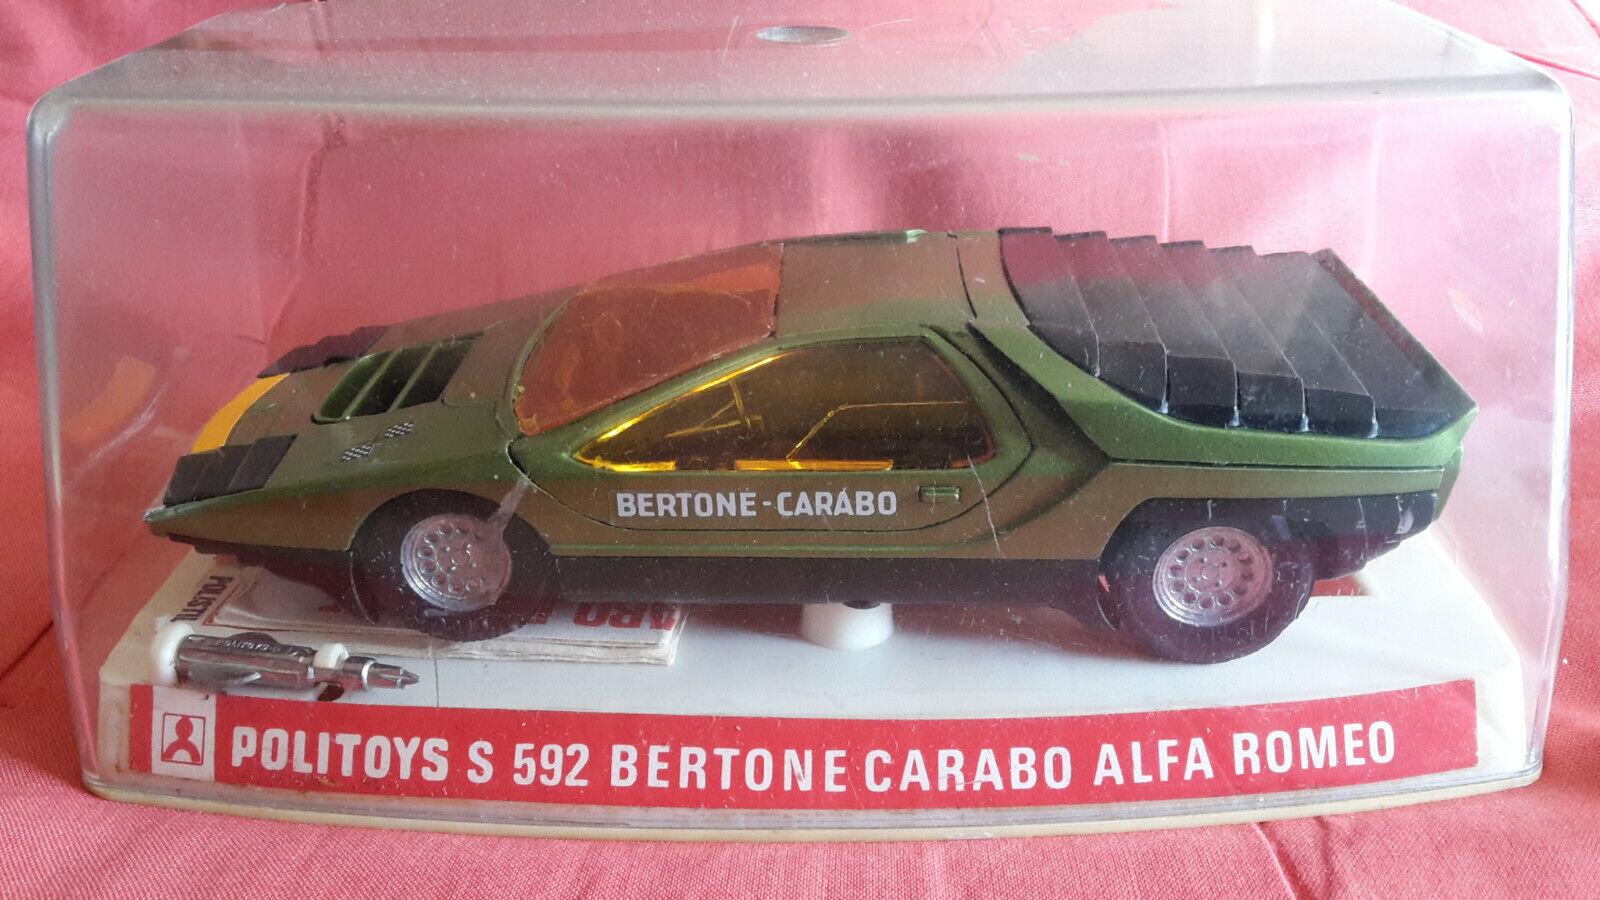 Bertone Carabo Alfa Romeo - Politoys 1 25 con scatola